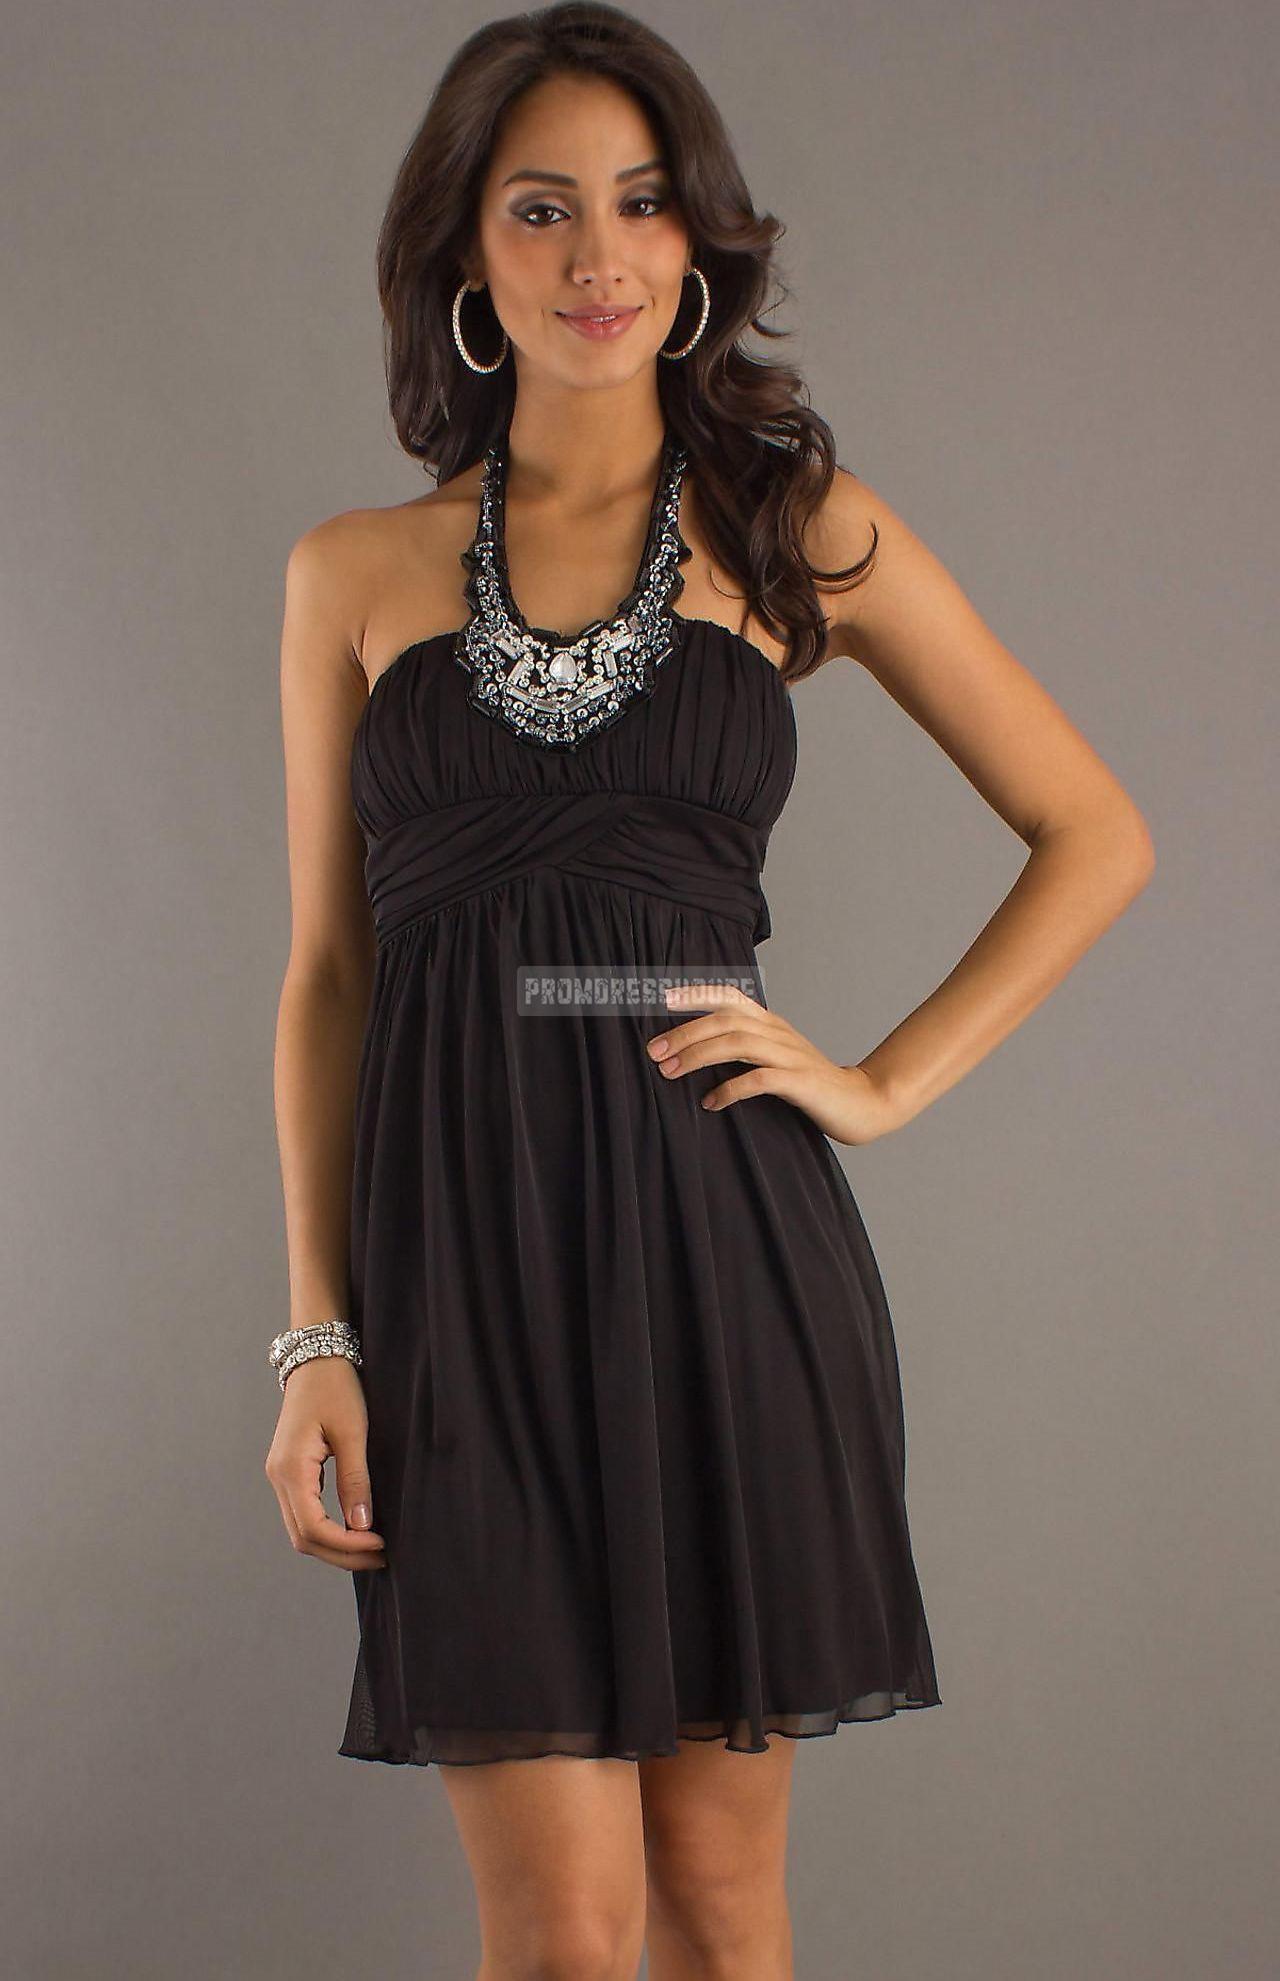 Beading Empire Halter Chiffon A-line Open Back Black Cocktail Dress - Promdresshouse.com